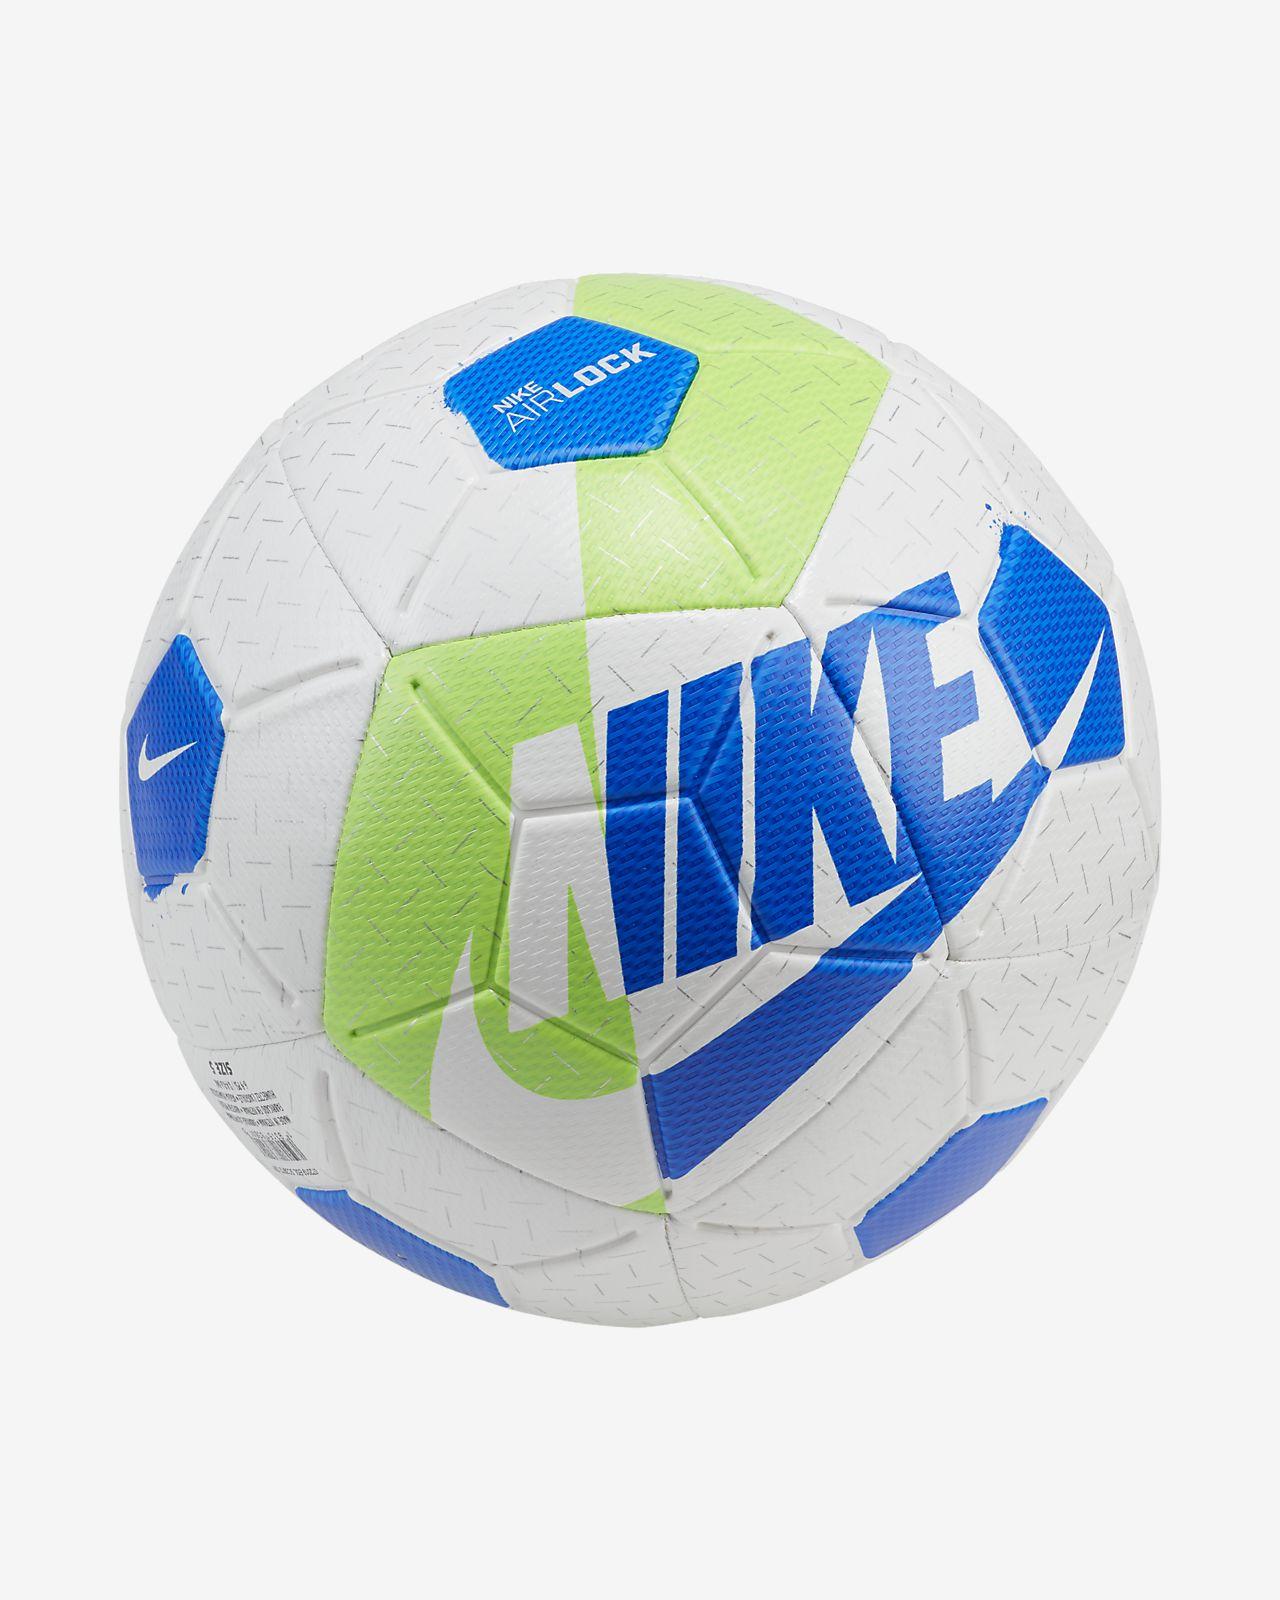 Nike Airlock Street X Fussball